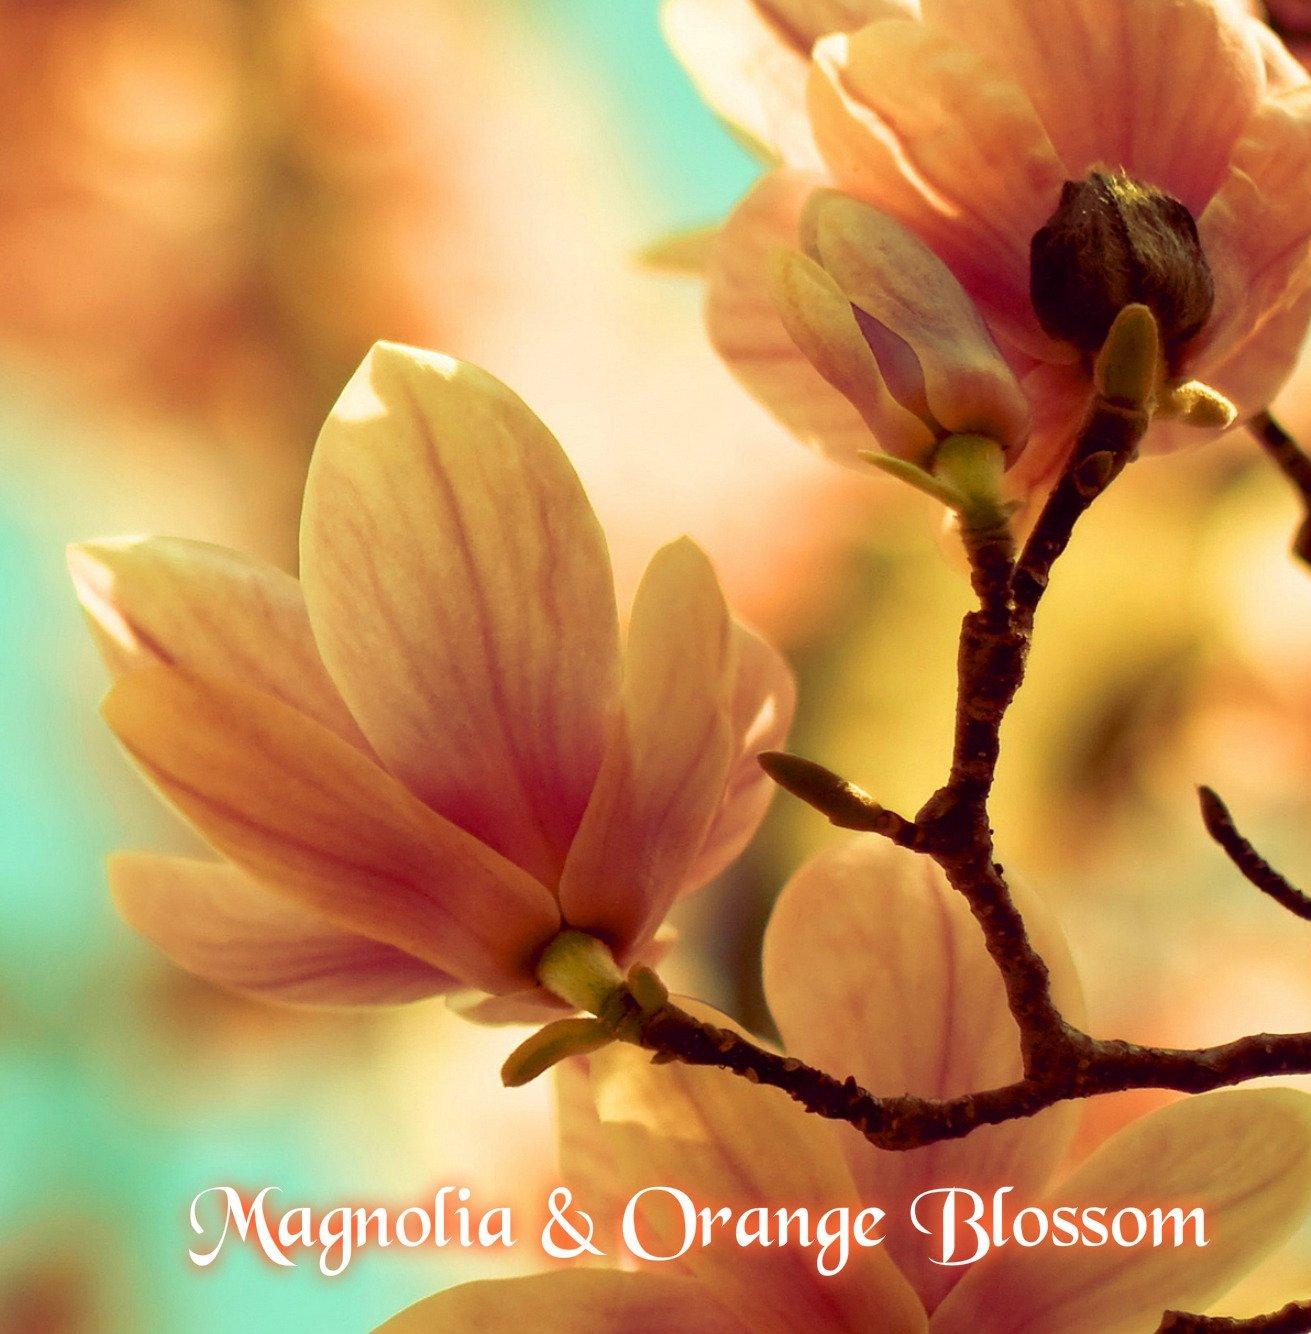 Magnolia And Orange Blossom Wax Melts Wax Melts Soy Wax Melts